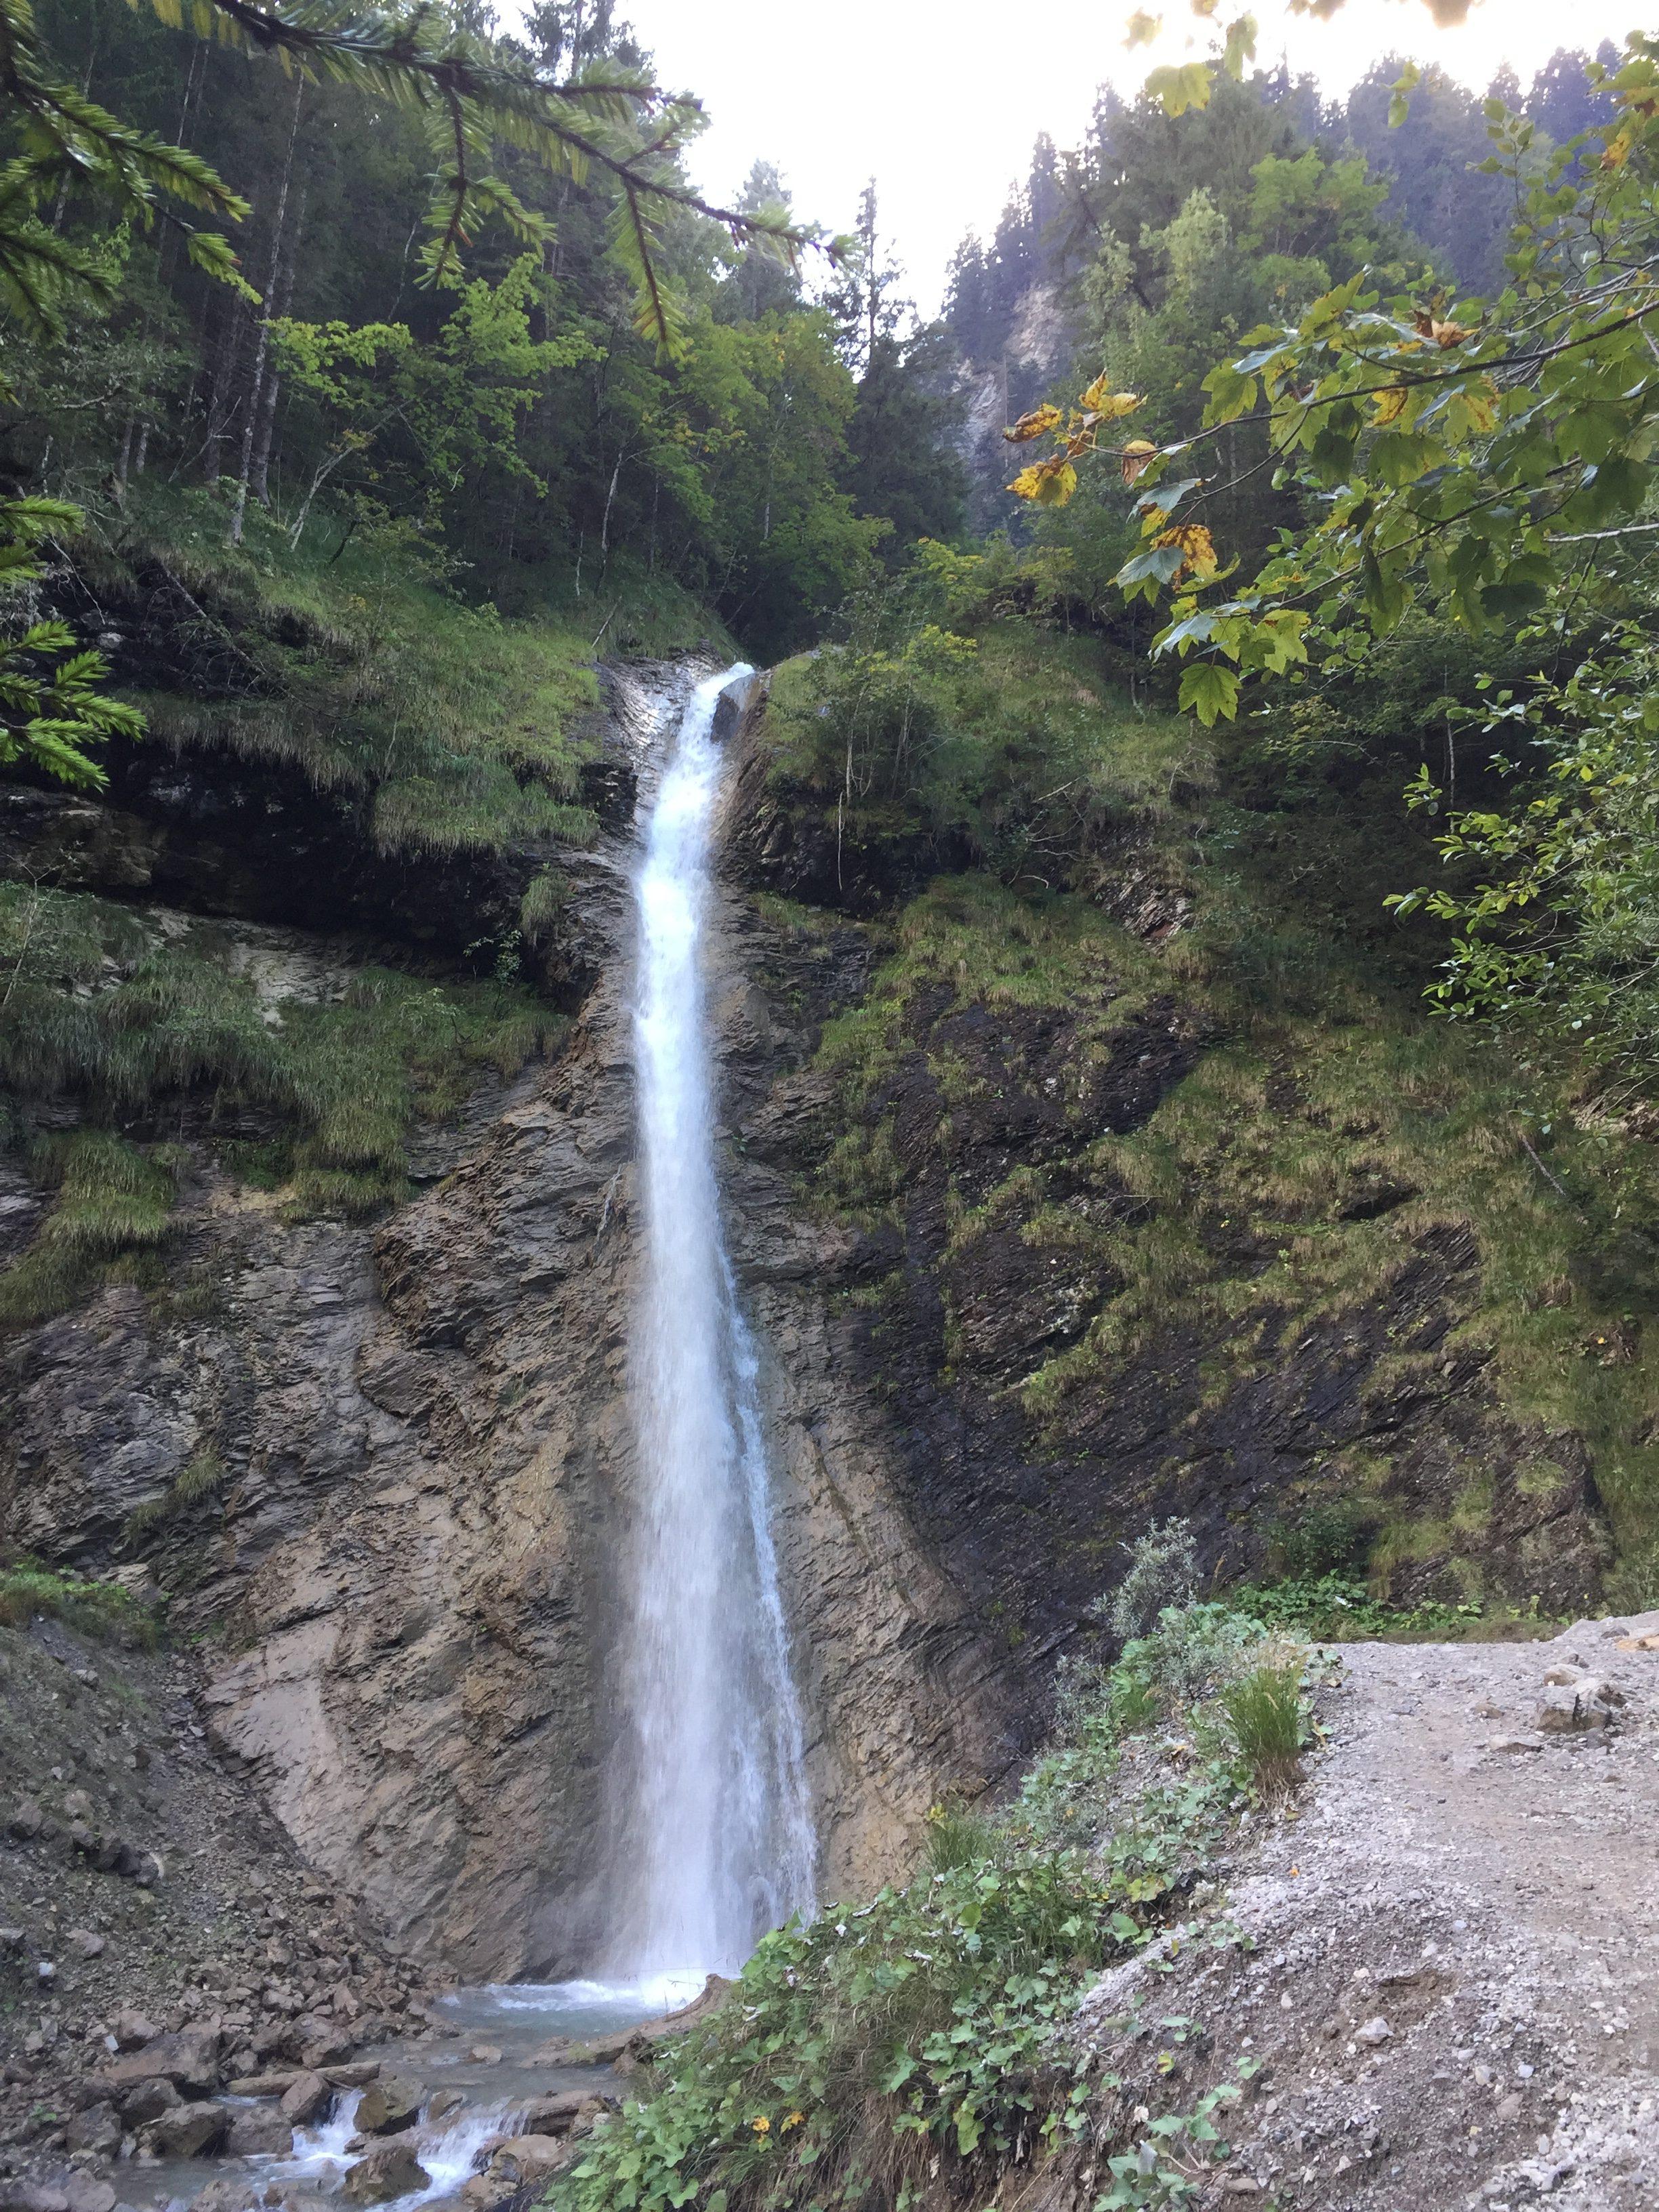 Wasserfall Marul, Wandern mit Kindern, Vorarlberg, Walderlebnispfad Marul, Biosphärenpark Marul